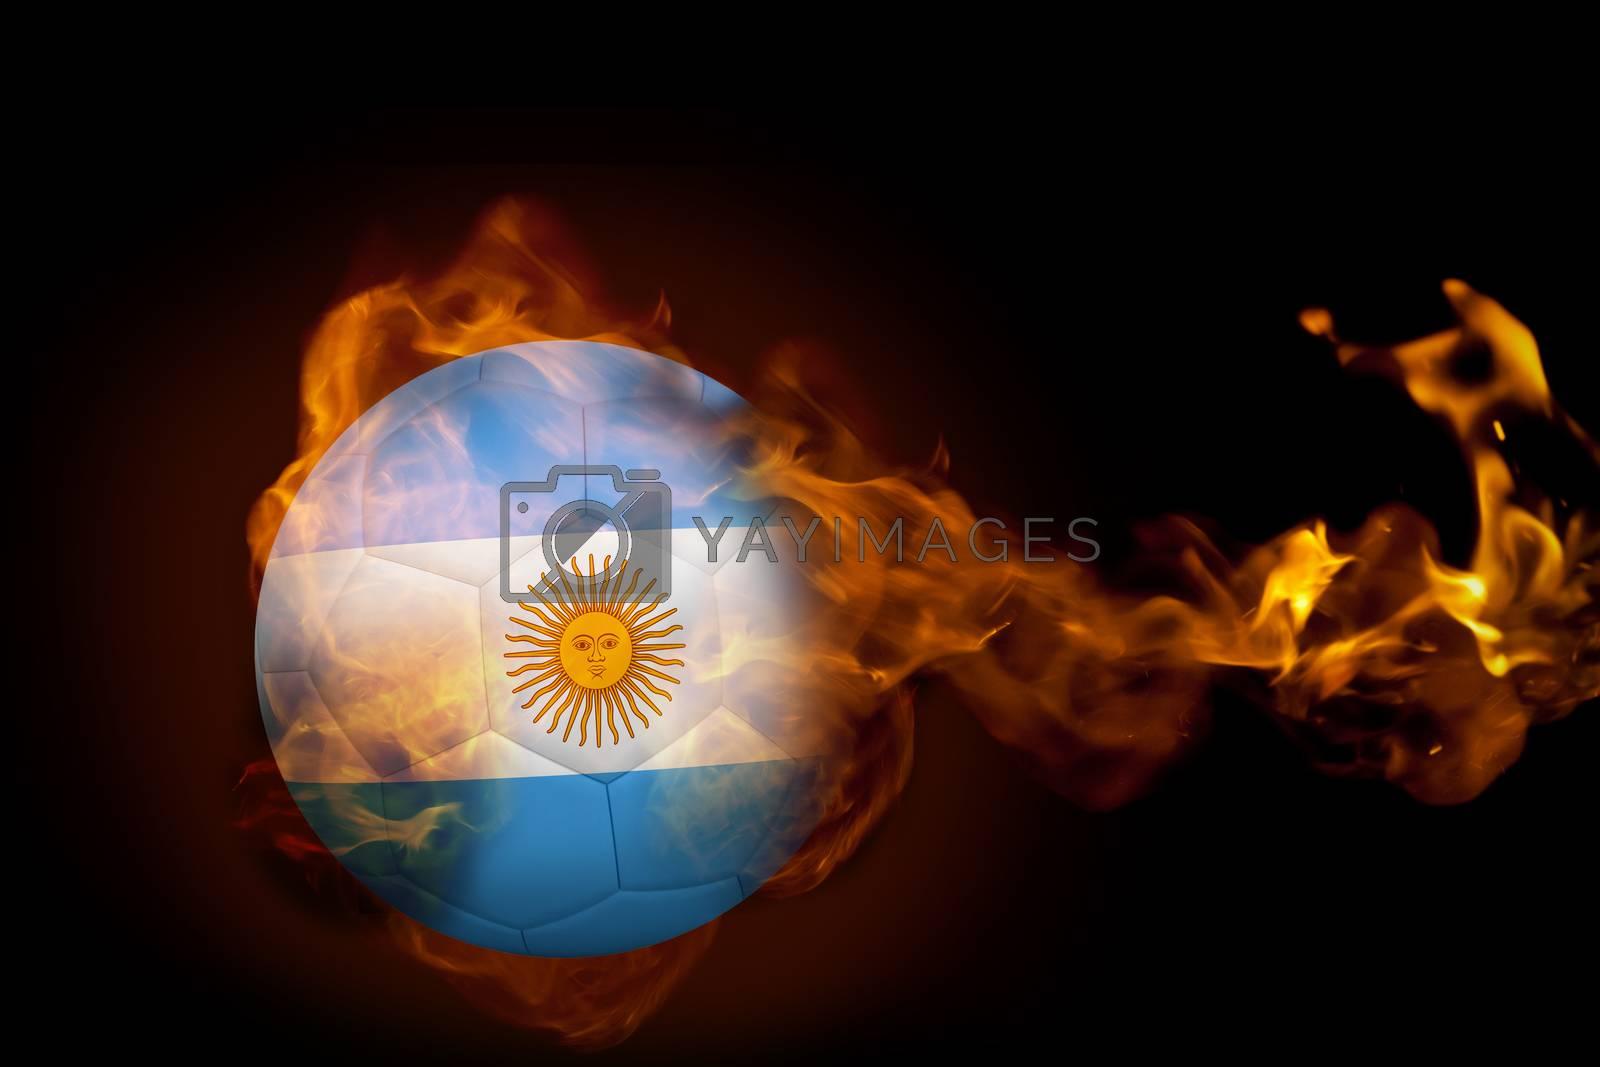 Fire surrounding argentina ball by Wavebreakmedia